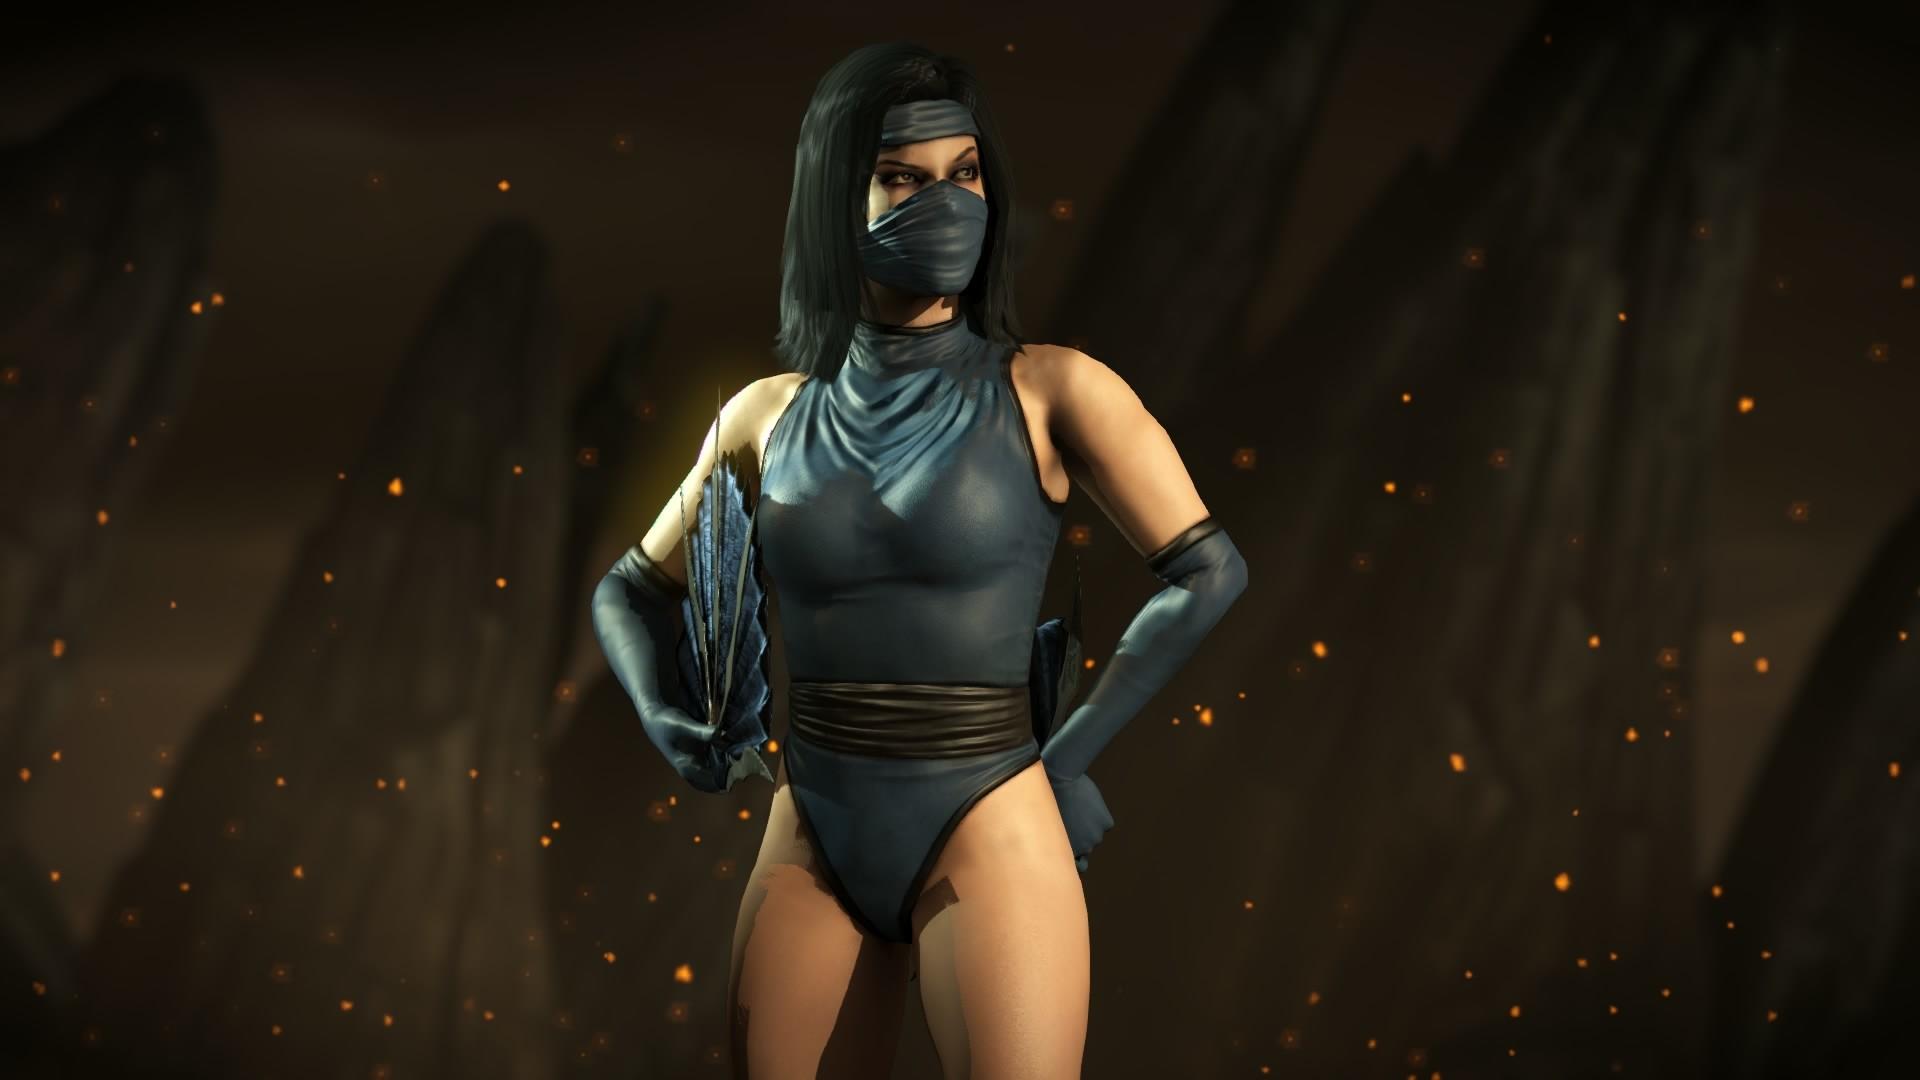 Mk Klassic Costumes & Rubieu0027s Mortal Kombat Adult